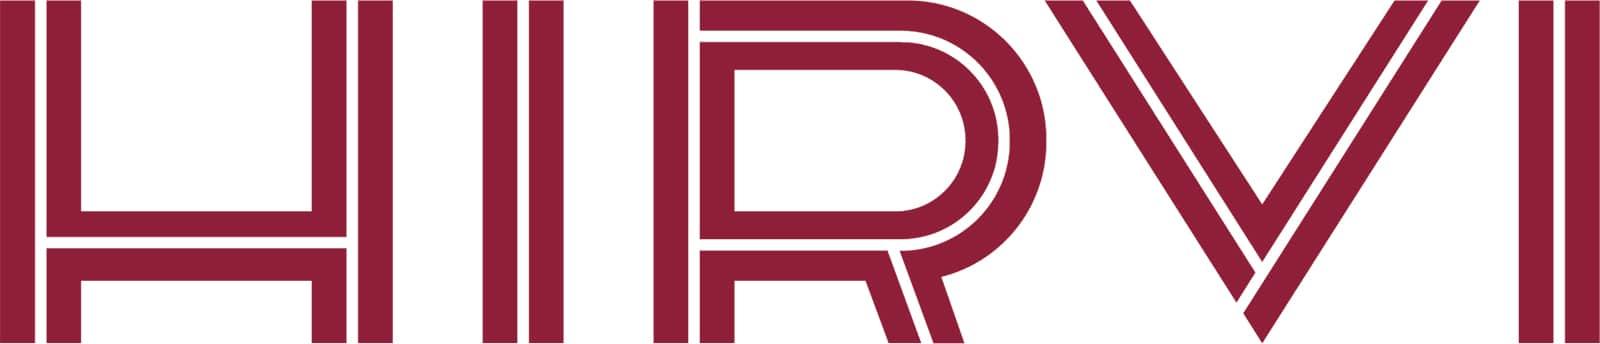 Hotelli Hirvi logo